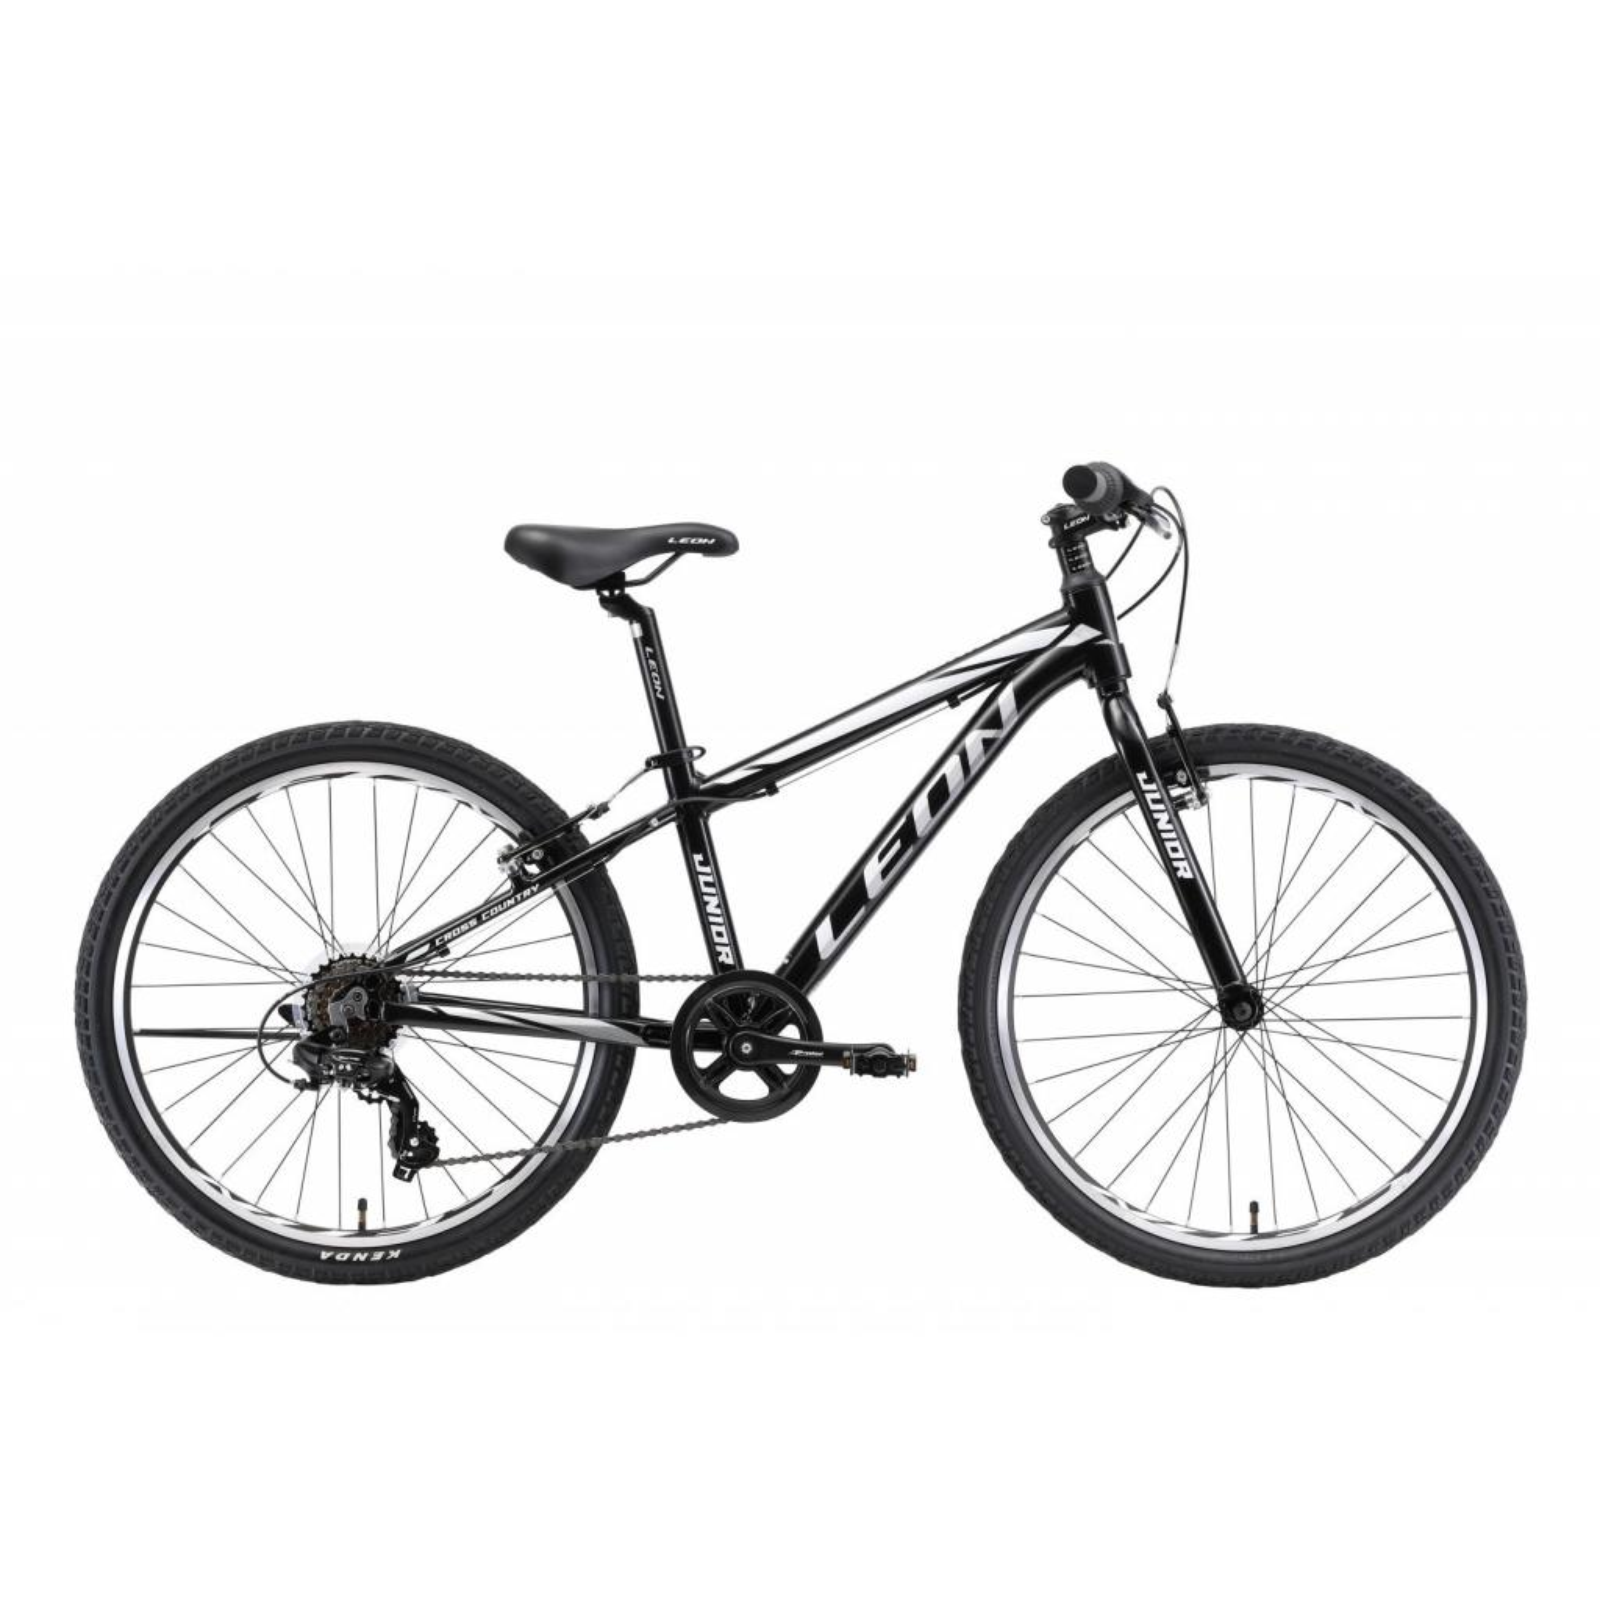 "Велосипед Leon 24"" JUNIOR 2018 AM 14G DD рама-12,5"" Al чёрно-белый (OPS-LN-24-014)"